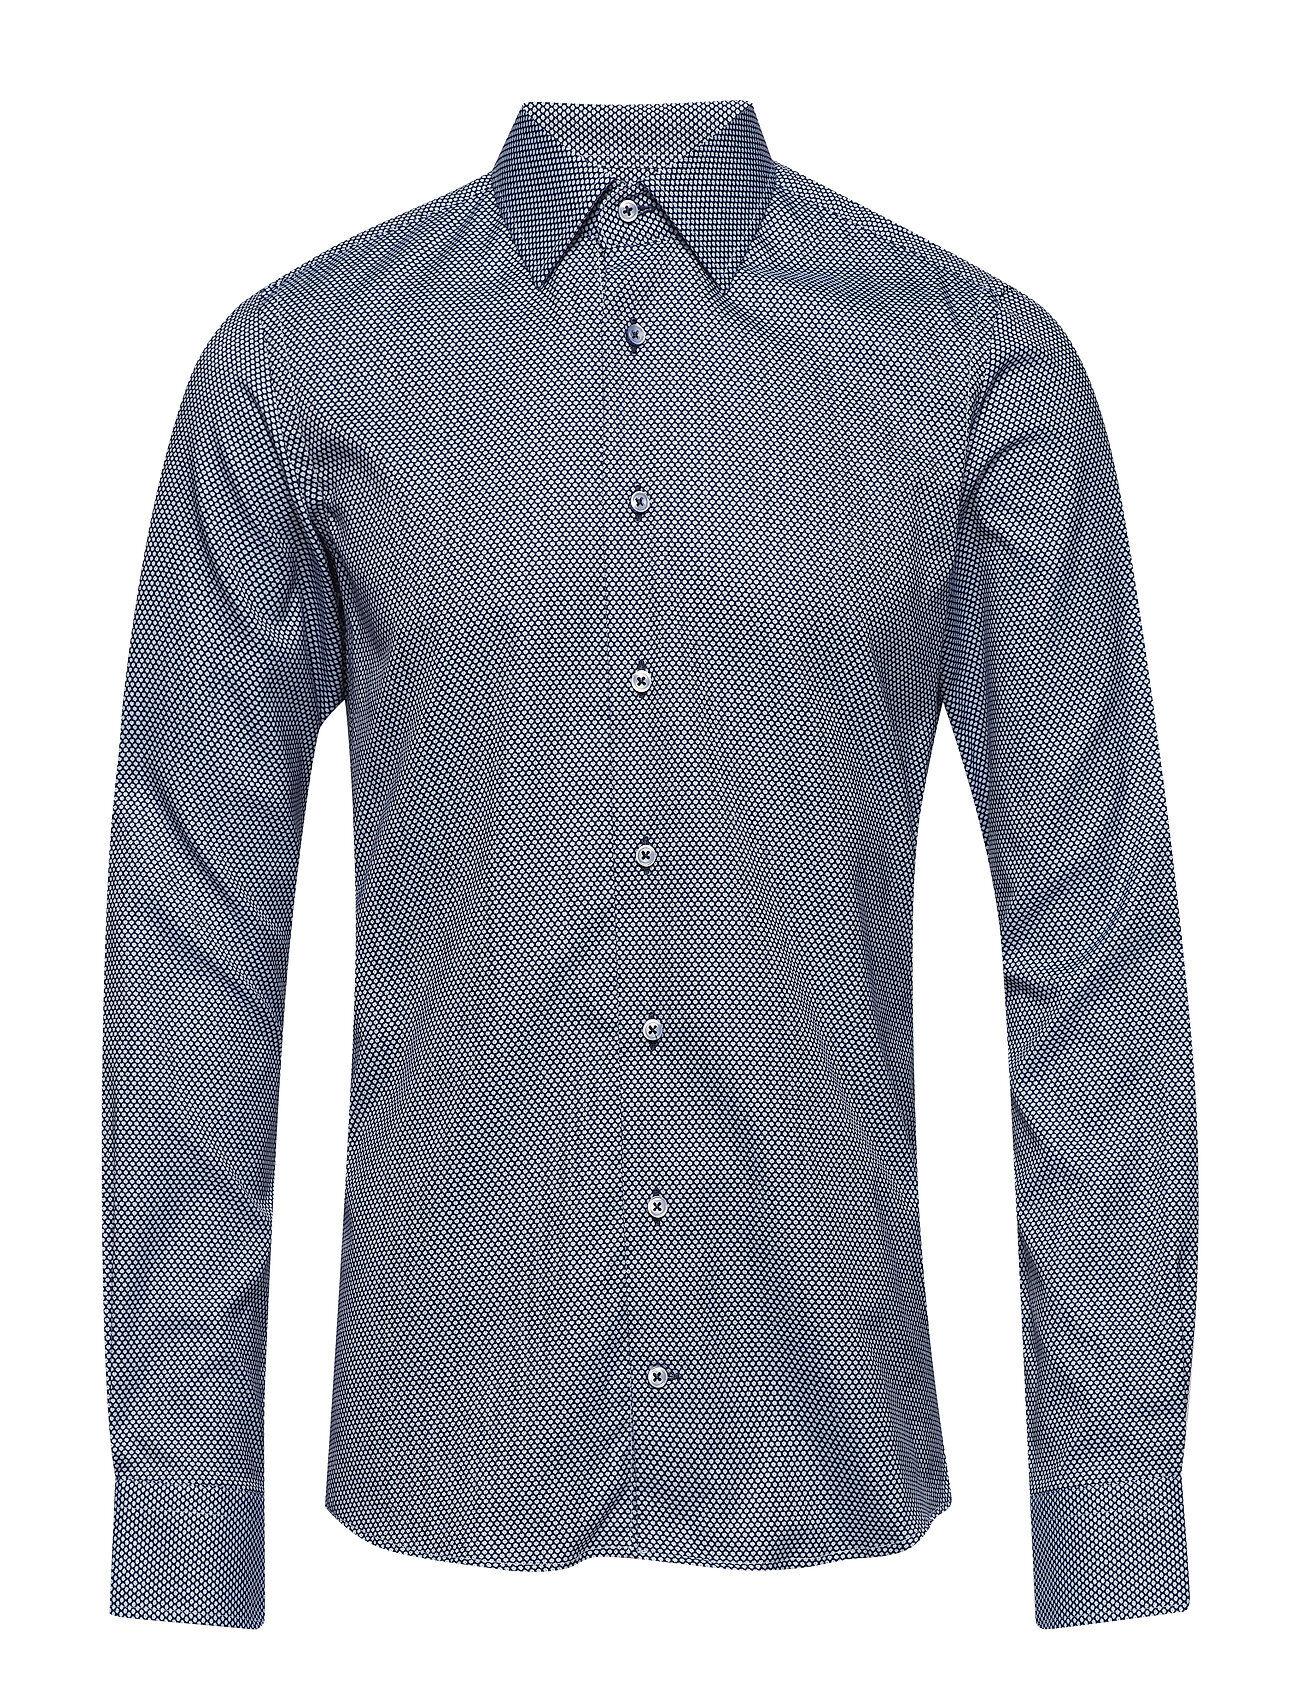 XO Shirtmaker by Sand Copenhagen 8086 - Jake Sc